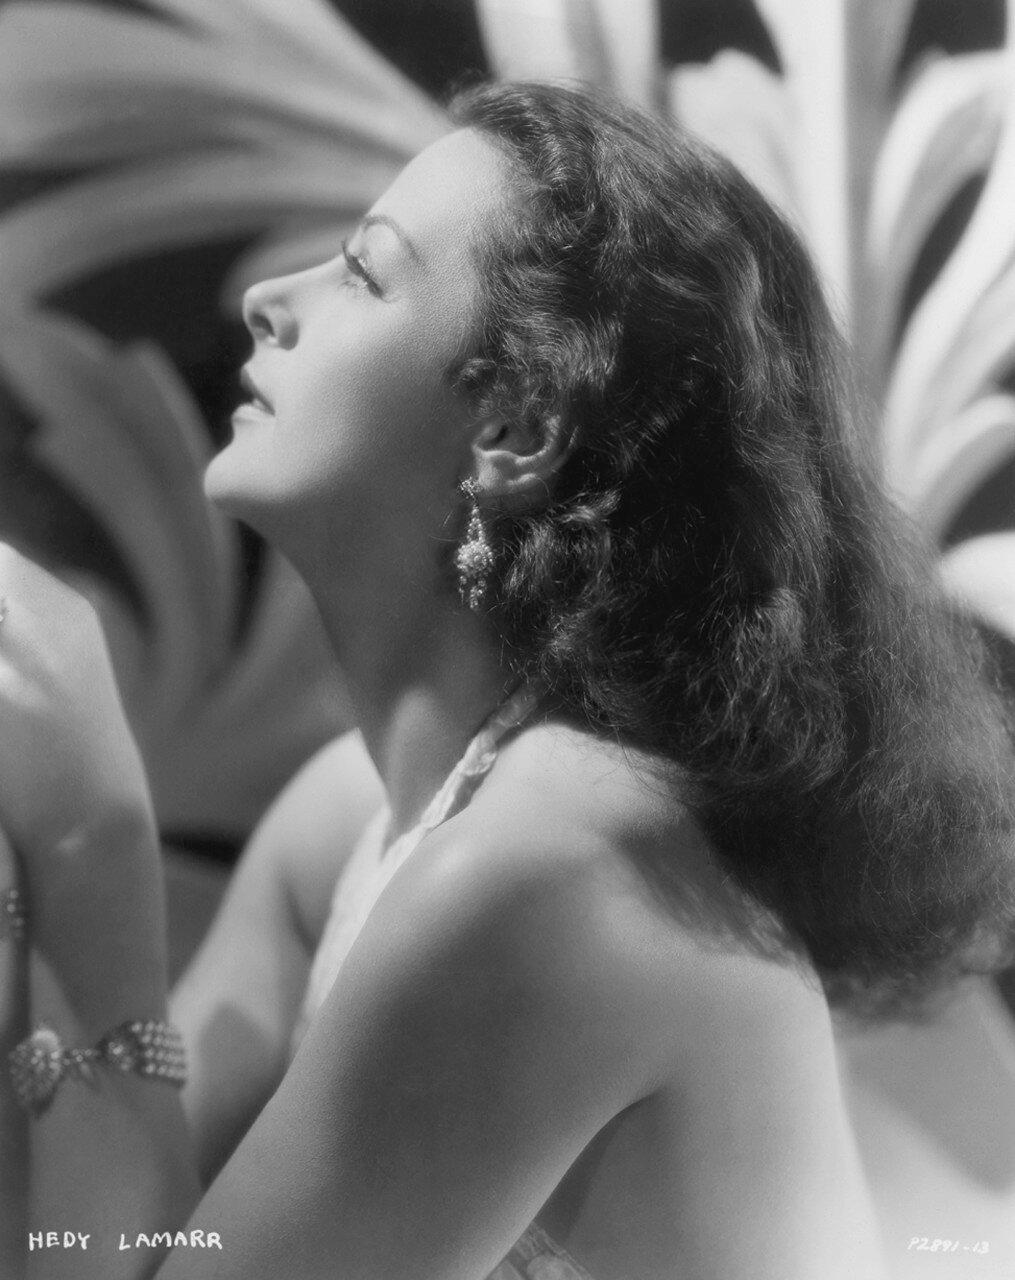 Portrait of Hedy Lamarr